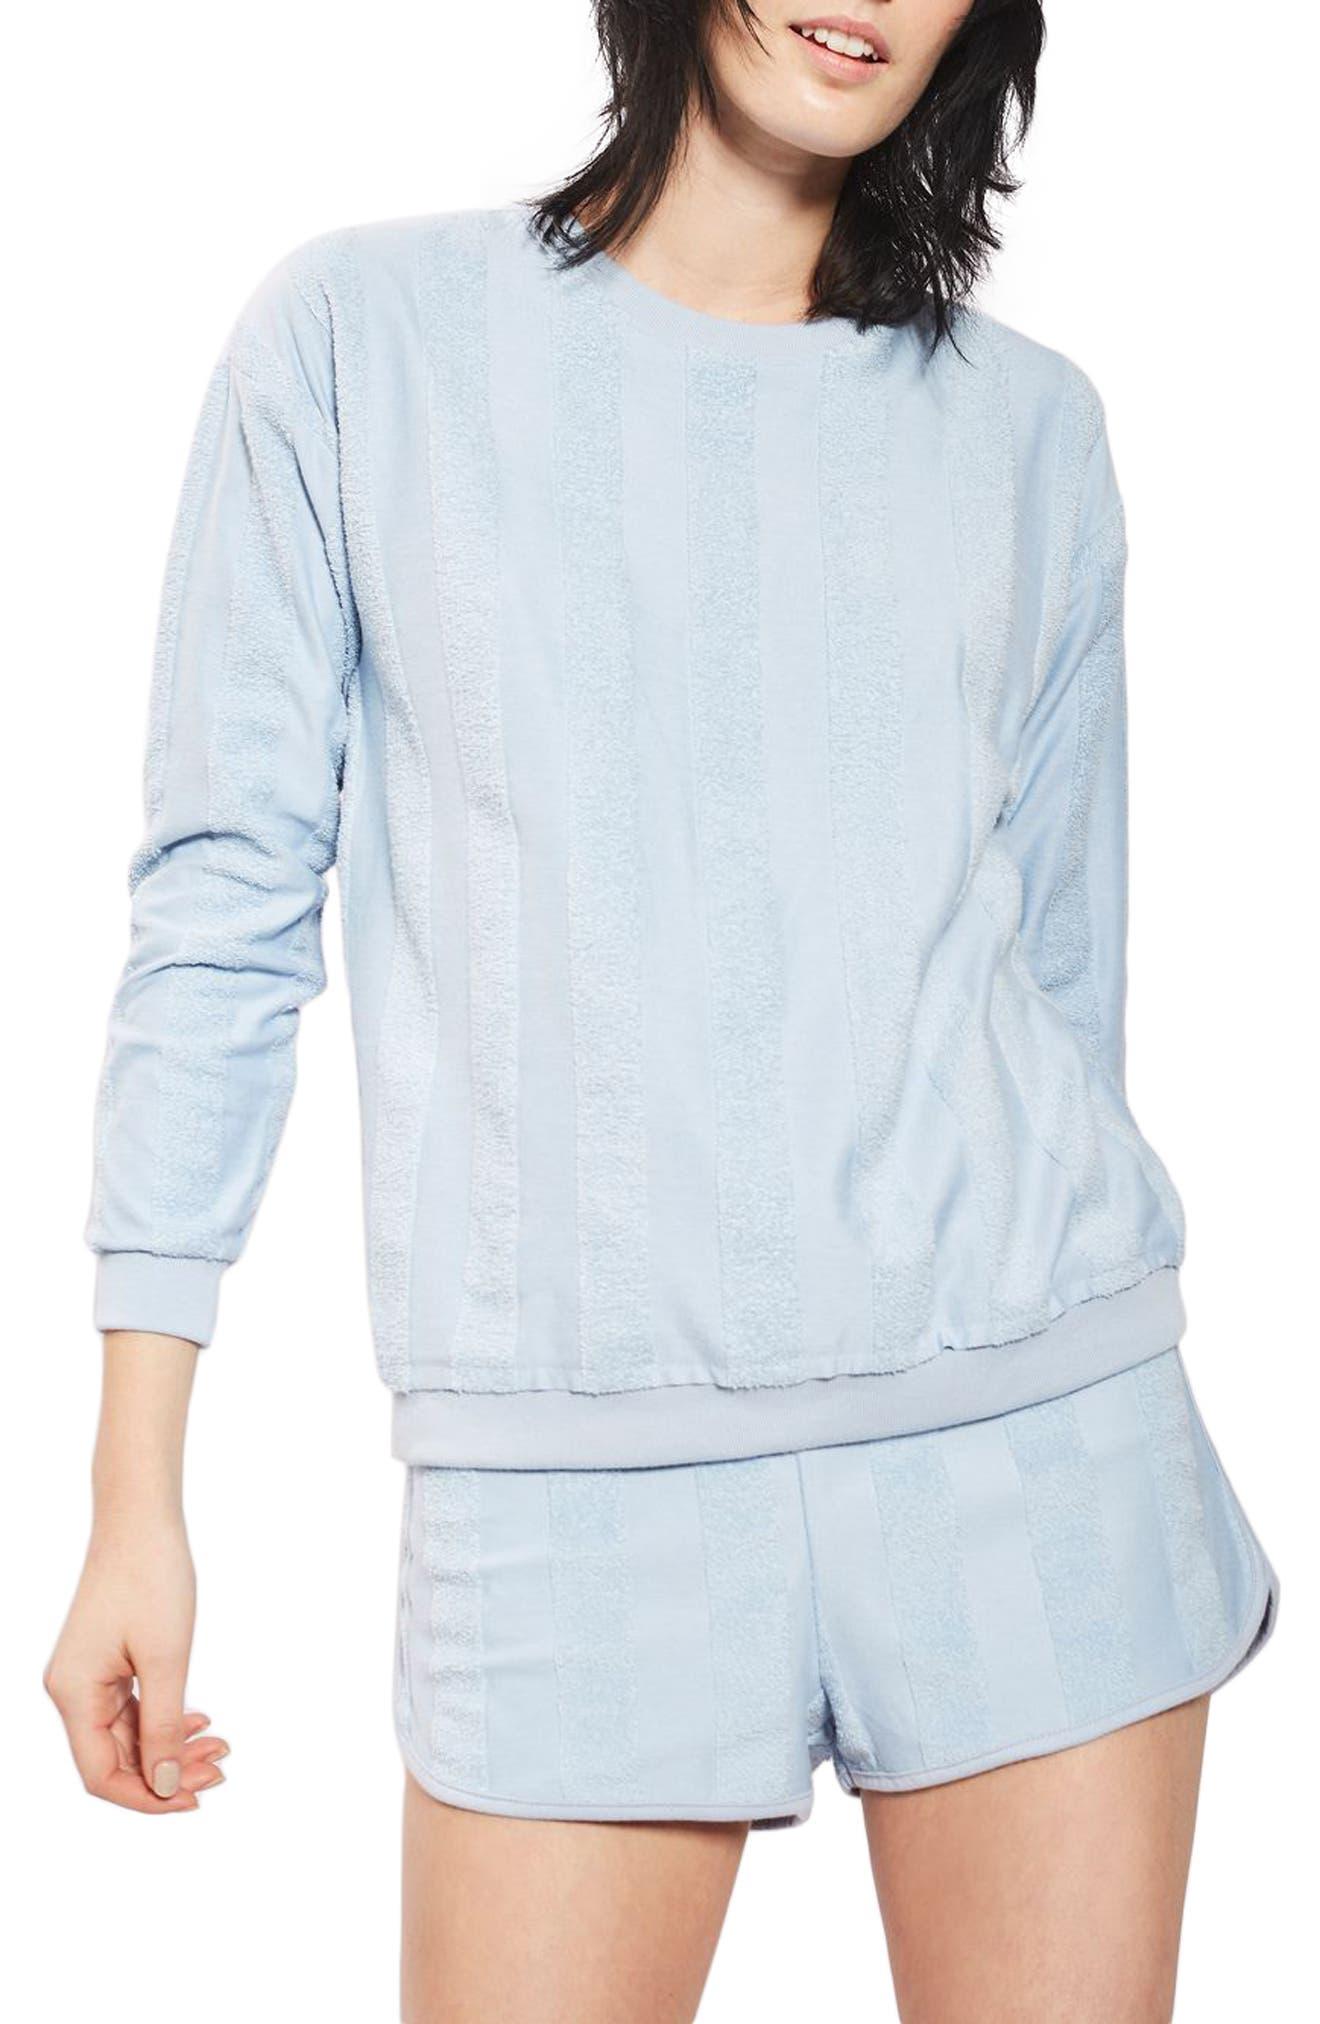 Towel Stripe Lounge Sweatshirt,                         Main,                         color, Light Blue